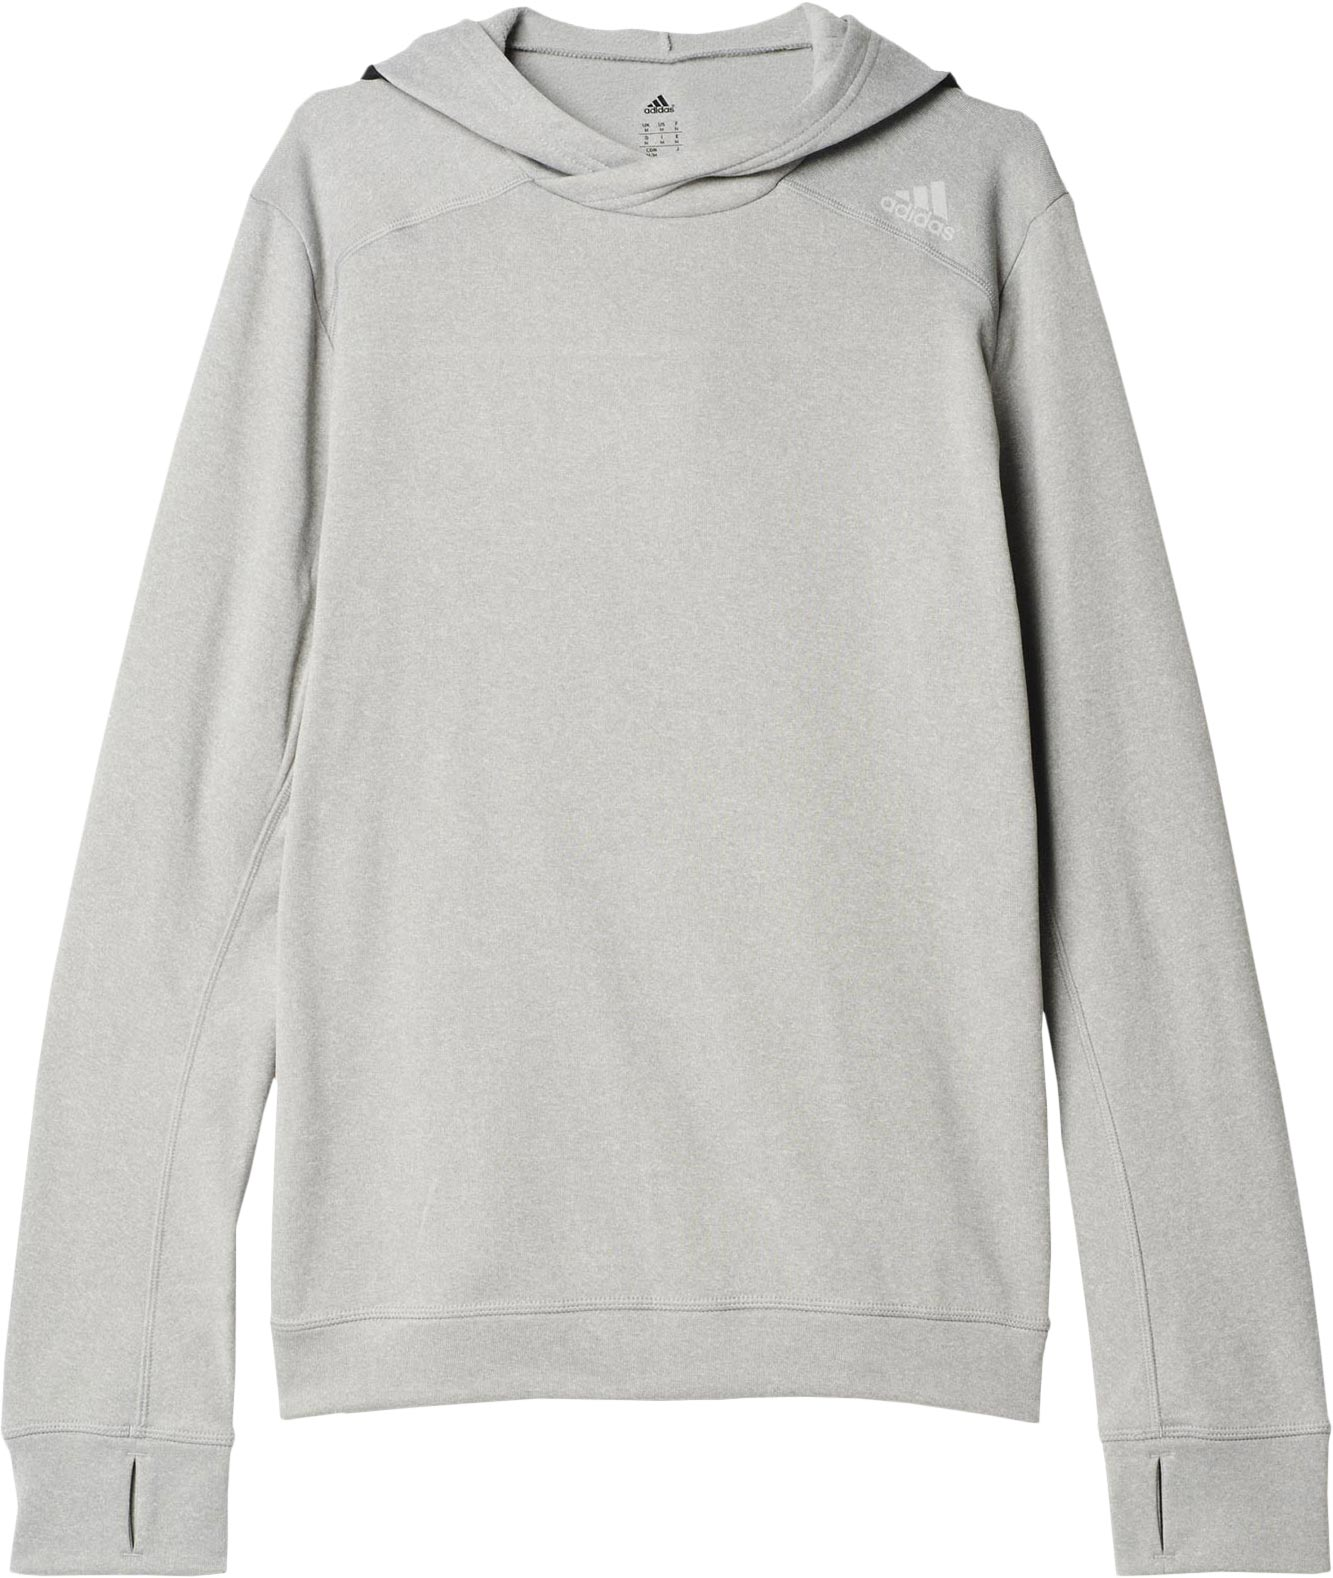 bluza adidas z.n.e fz hood knit s94807